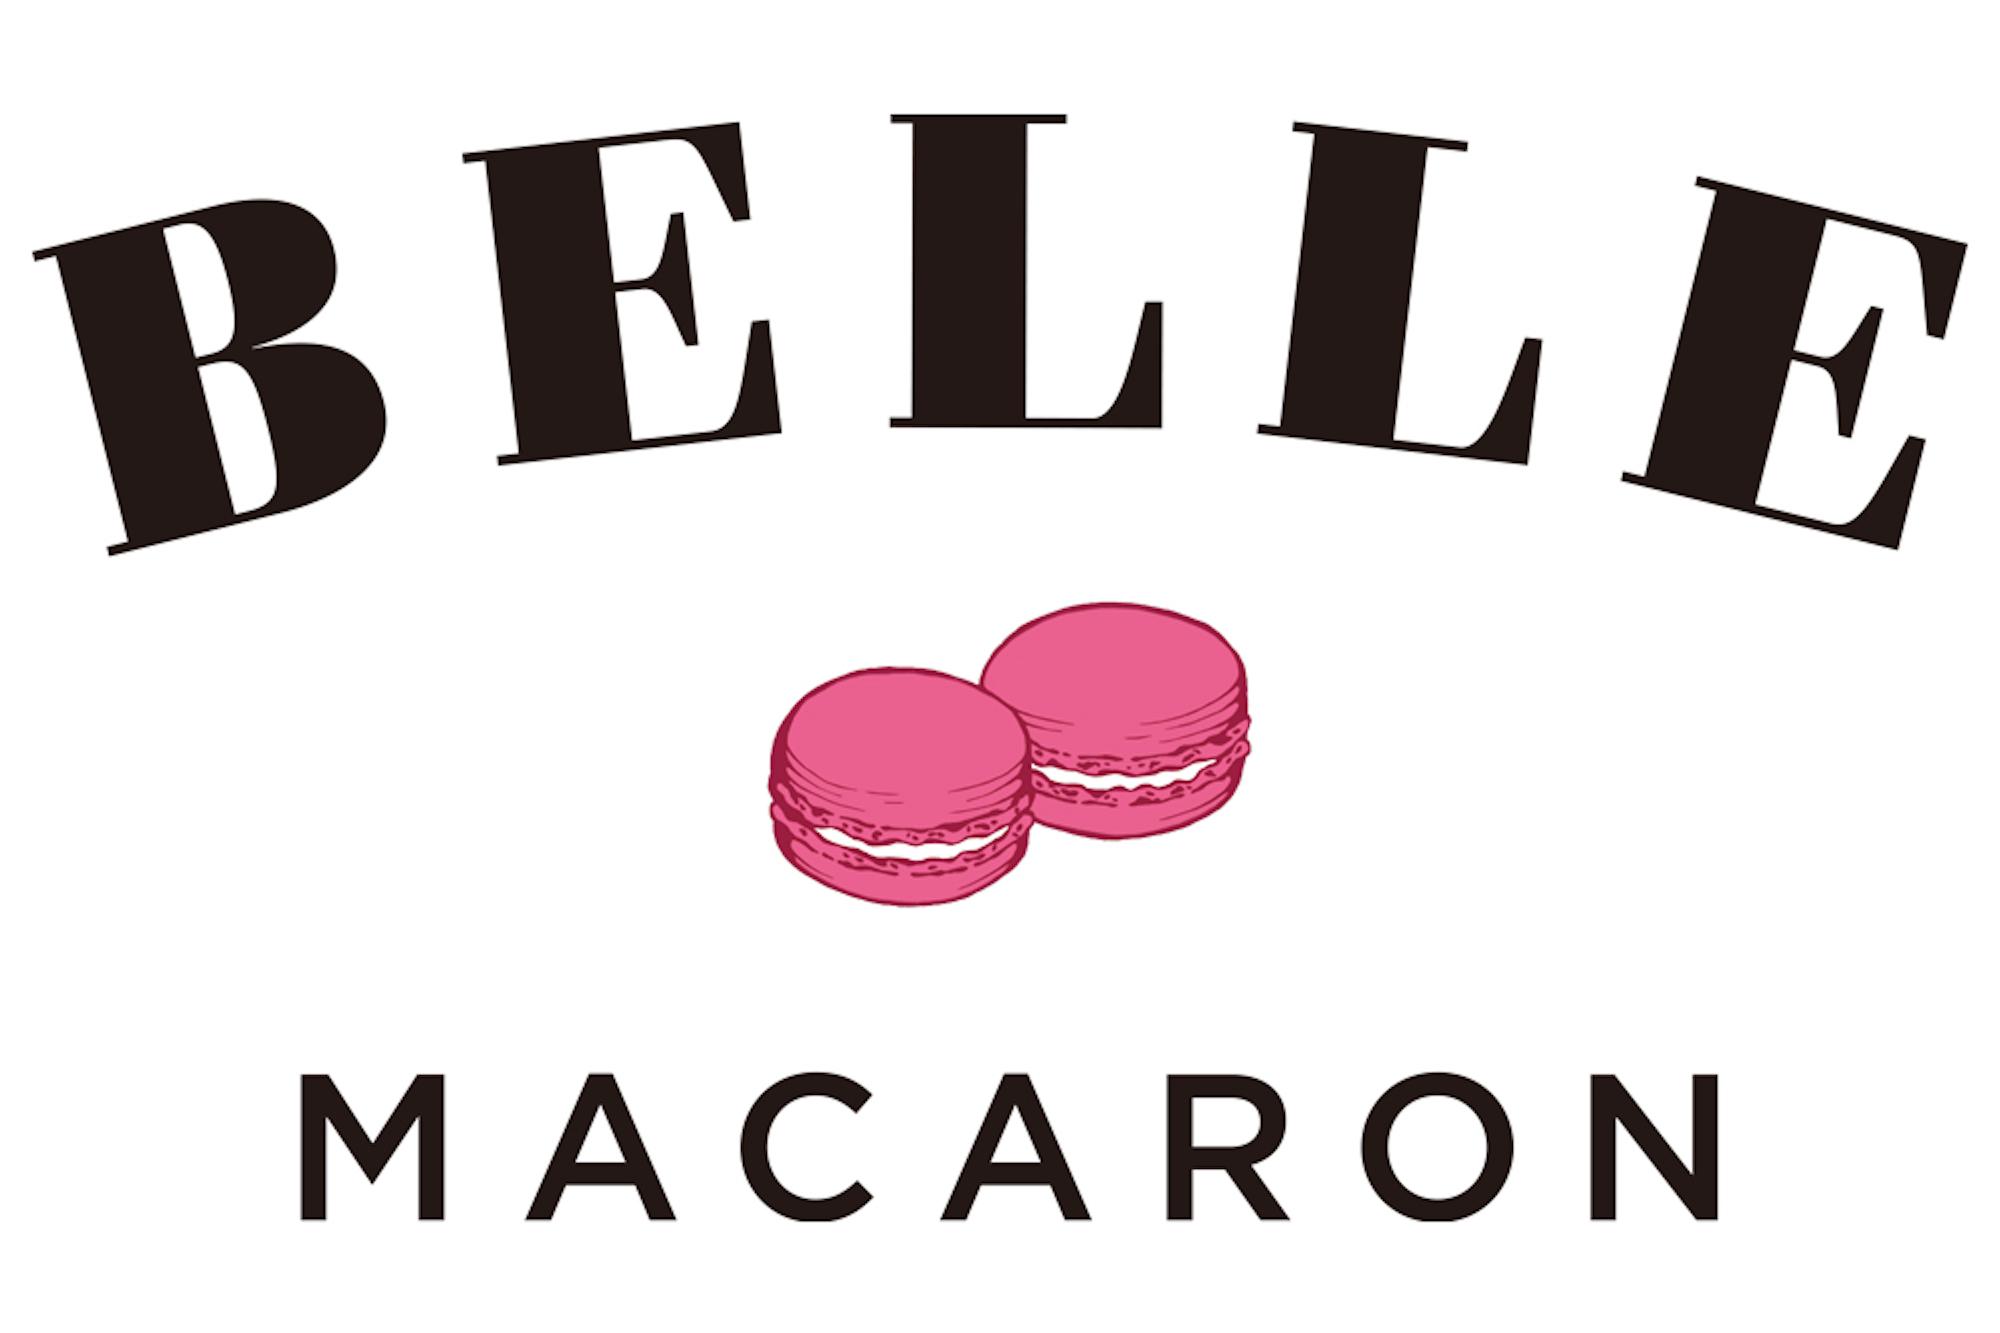 BELLE MACARON